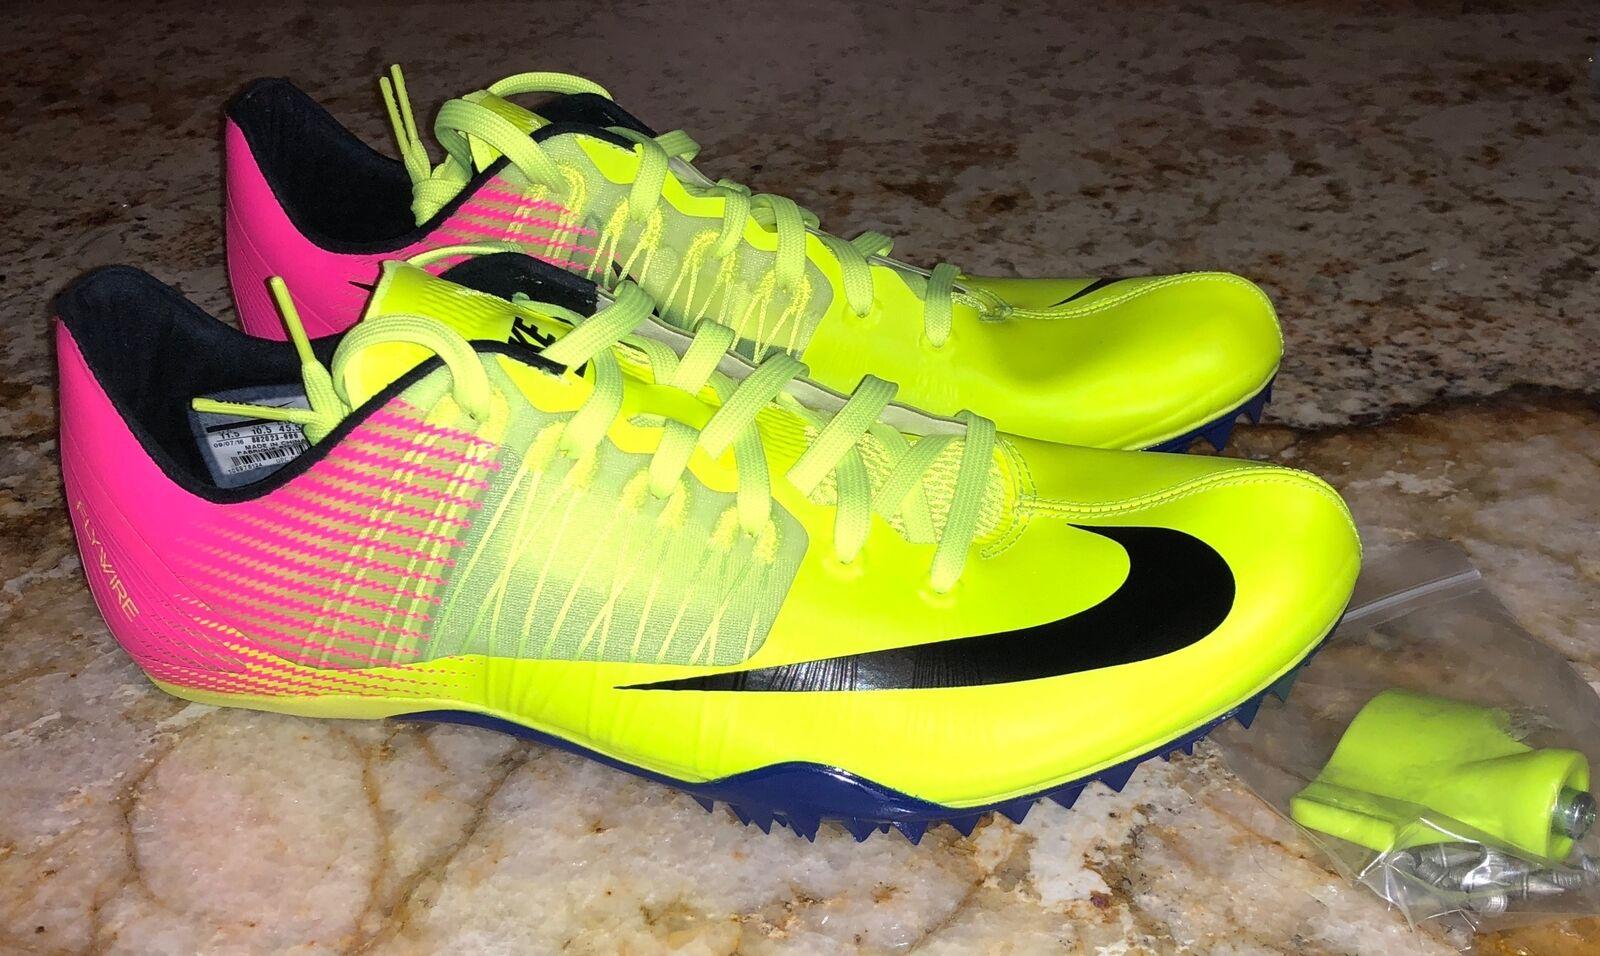 Nike celar 5 sprint traccia spuntoni scarpe rosa nero da nuovi Uomo 10 10,5 11 11,5